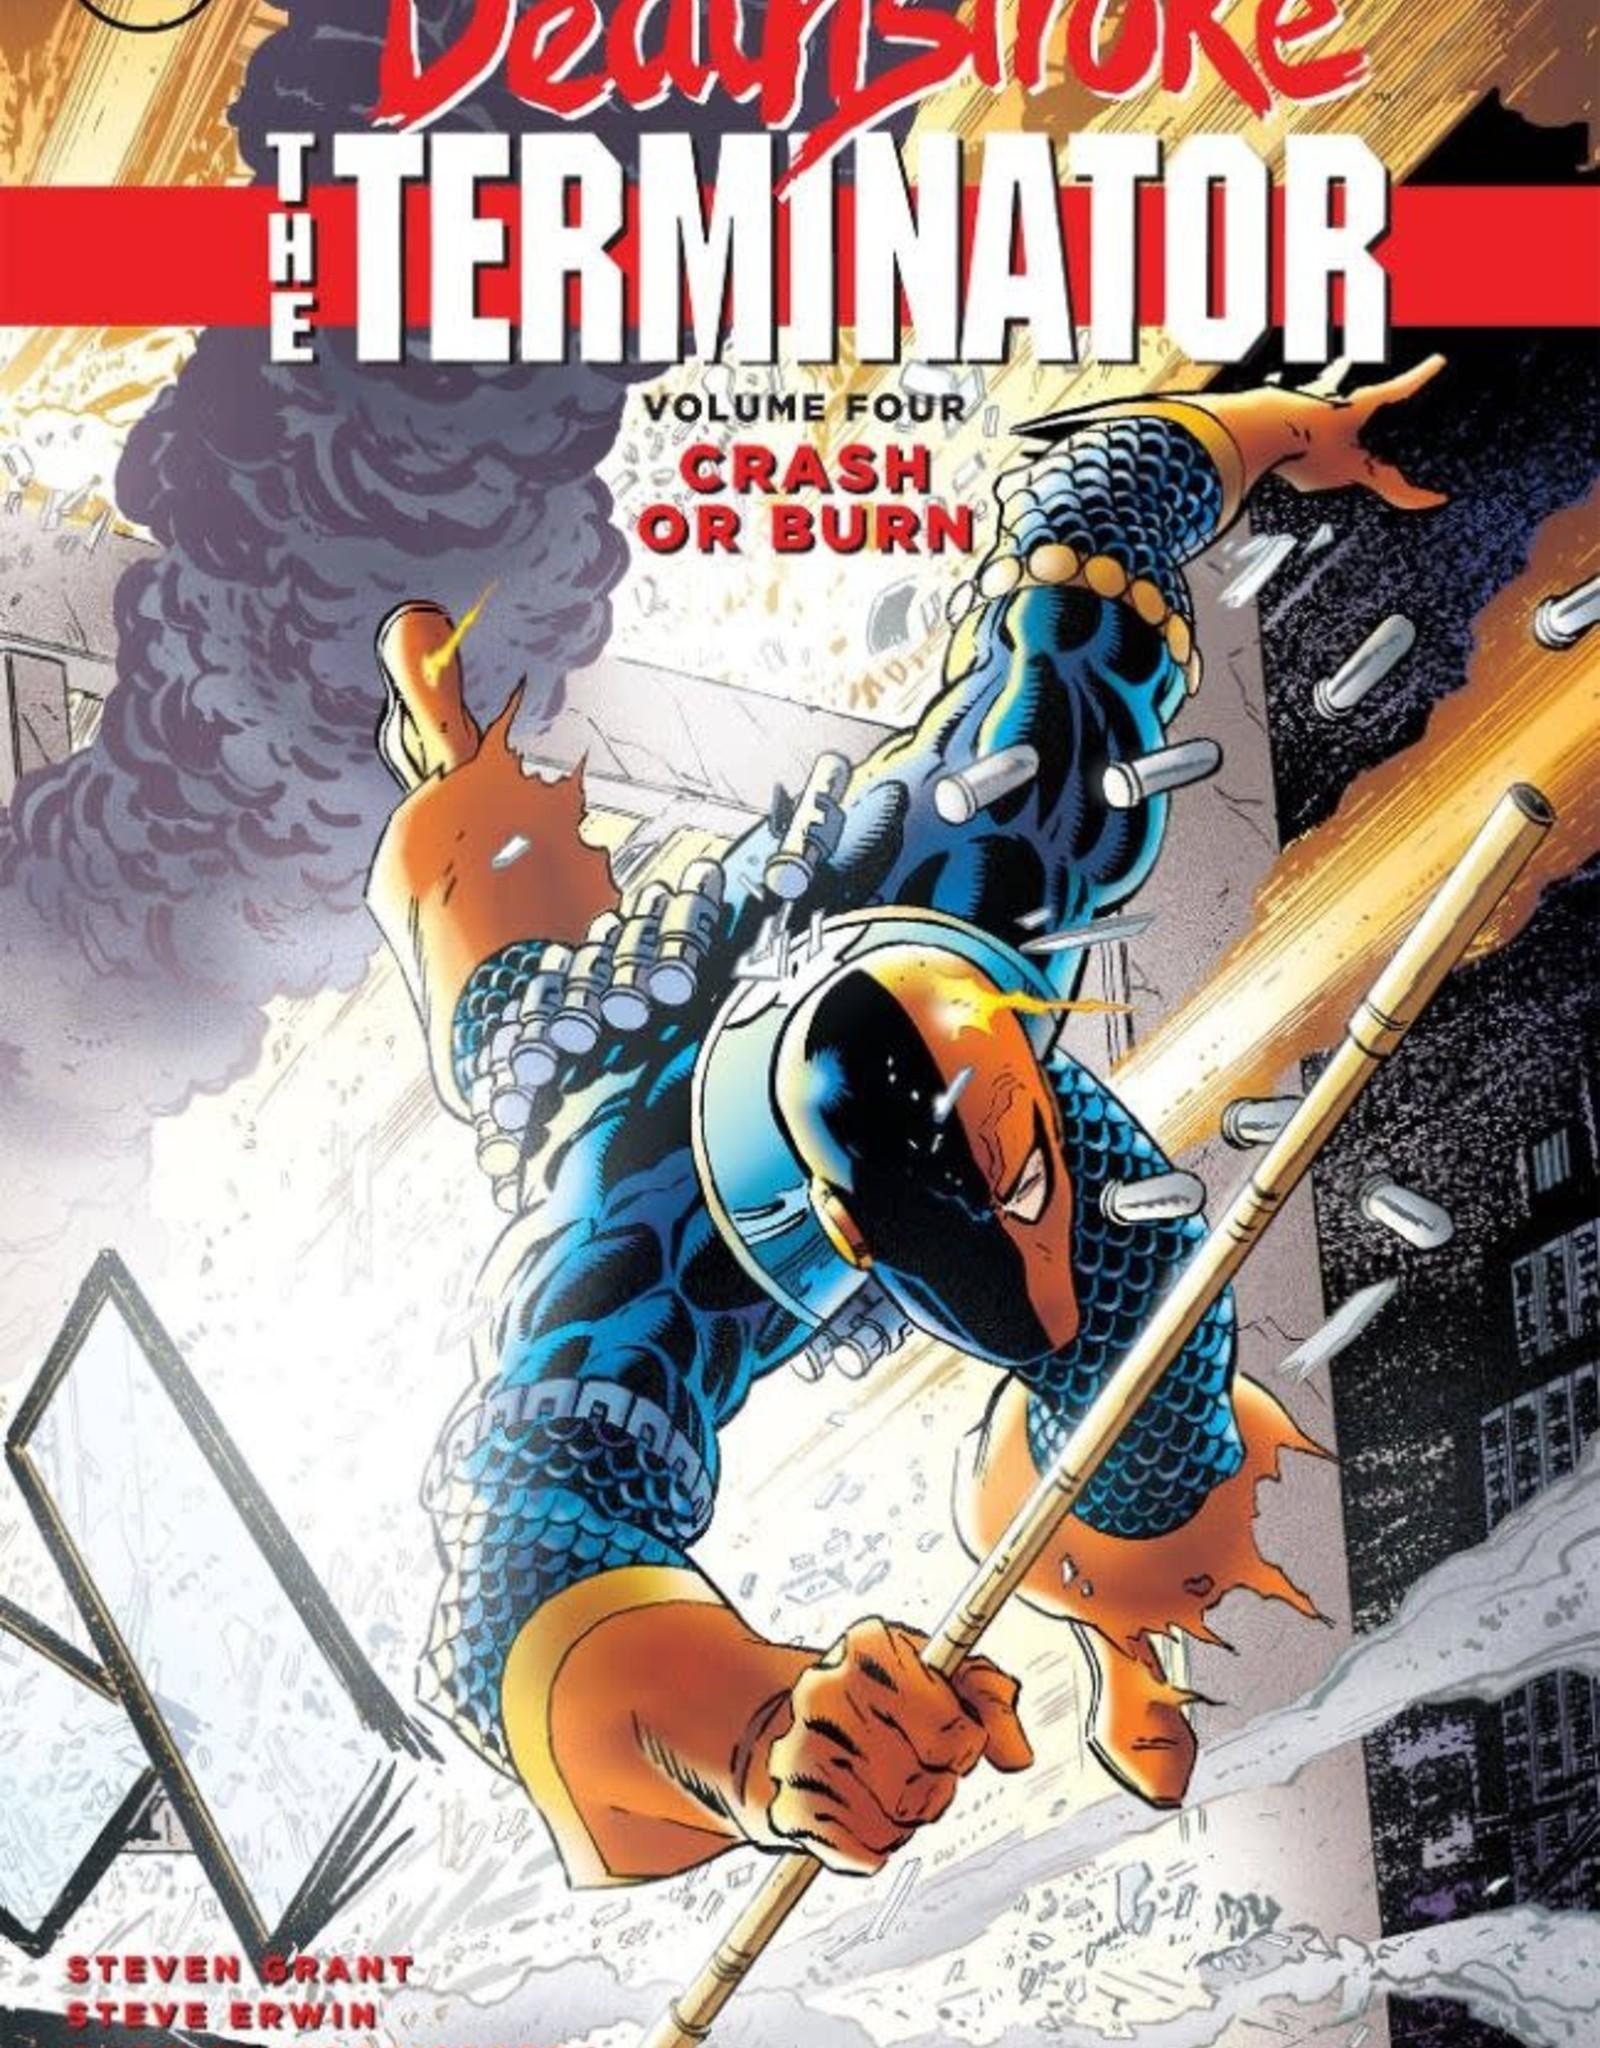 DC Comics Deathstroke the Terminator Vol 04 Crash or Burn